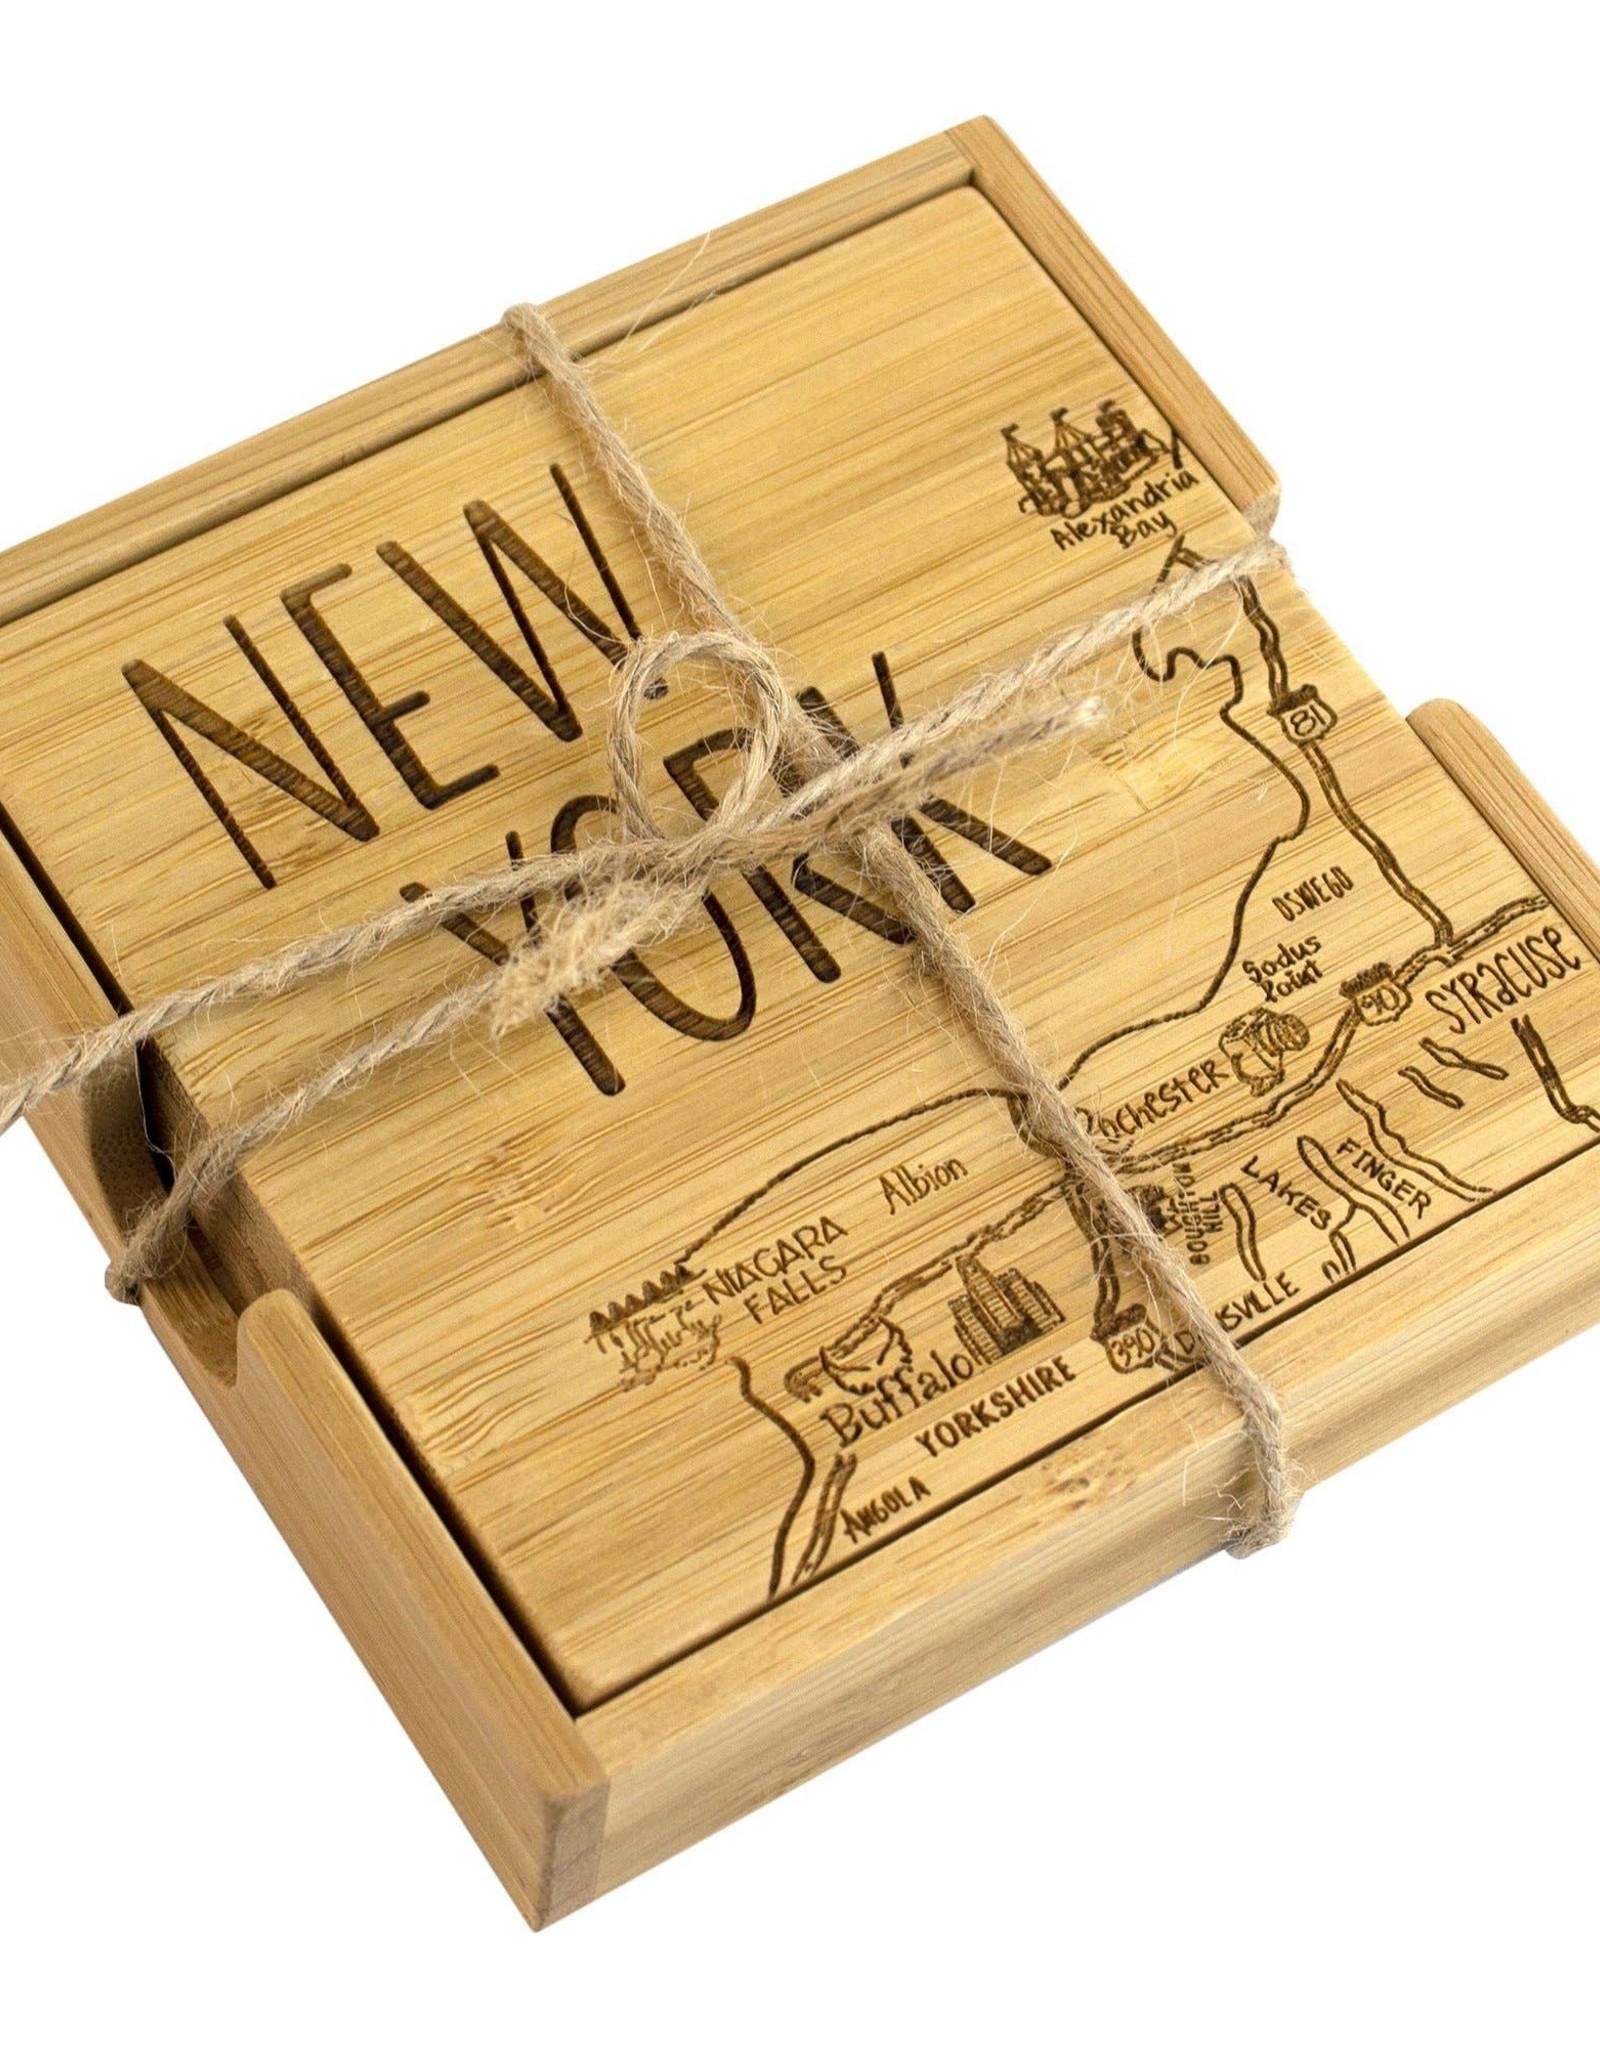 Totally Bamboo Coasters - New York Bamboo